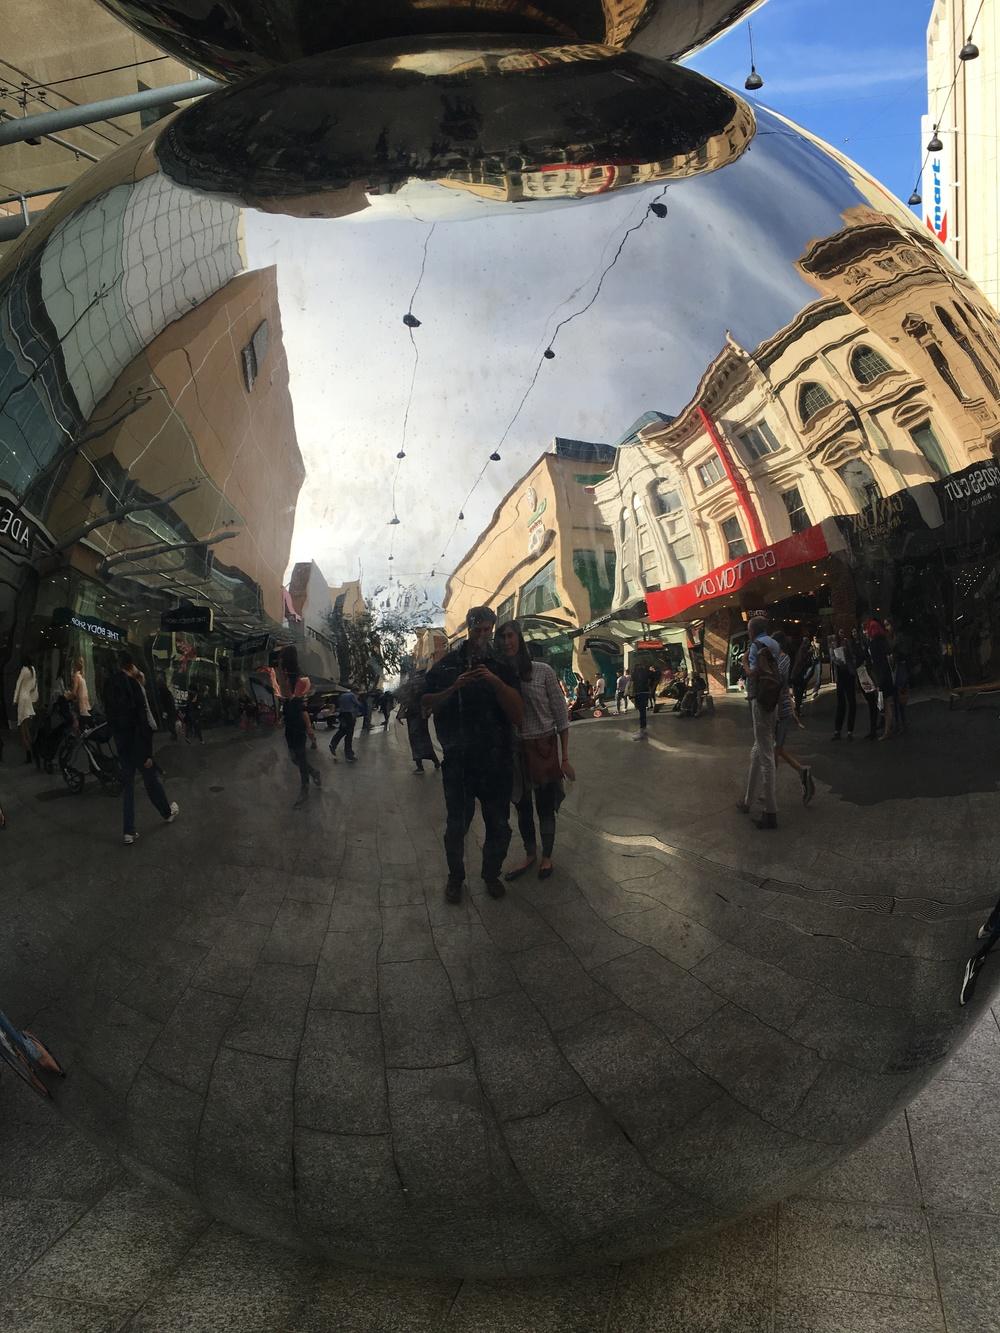 Rundle St Mall Mirror Ball Selfie